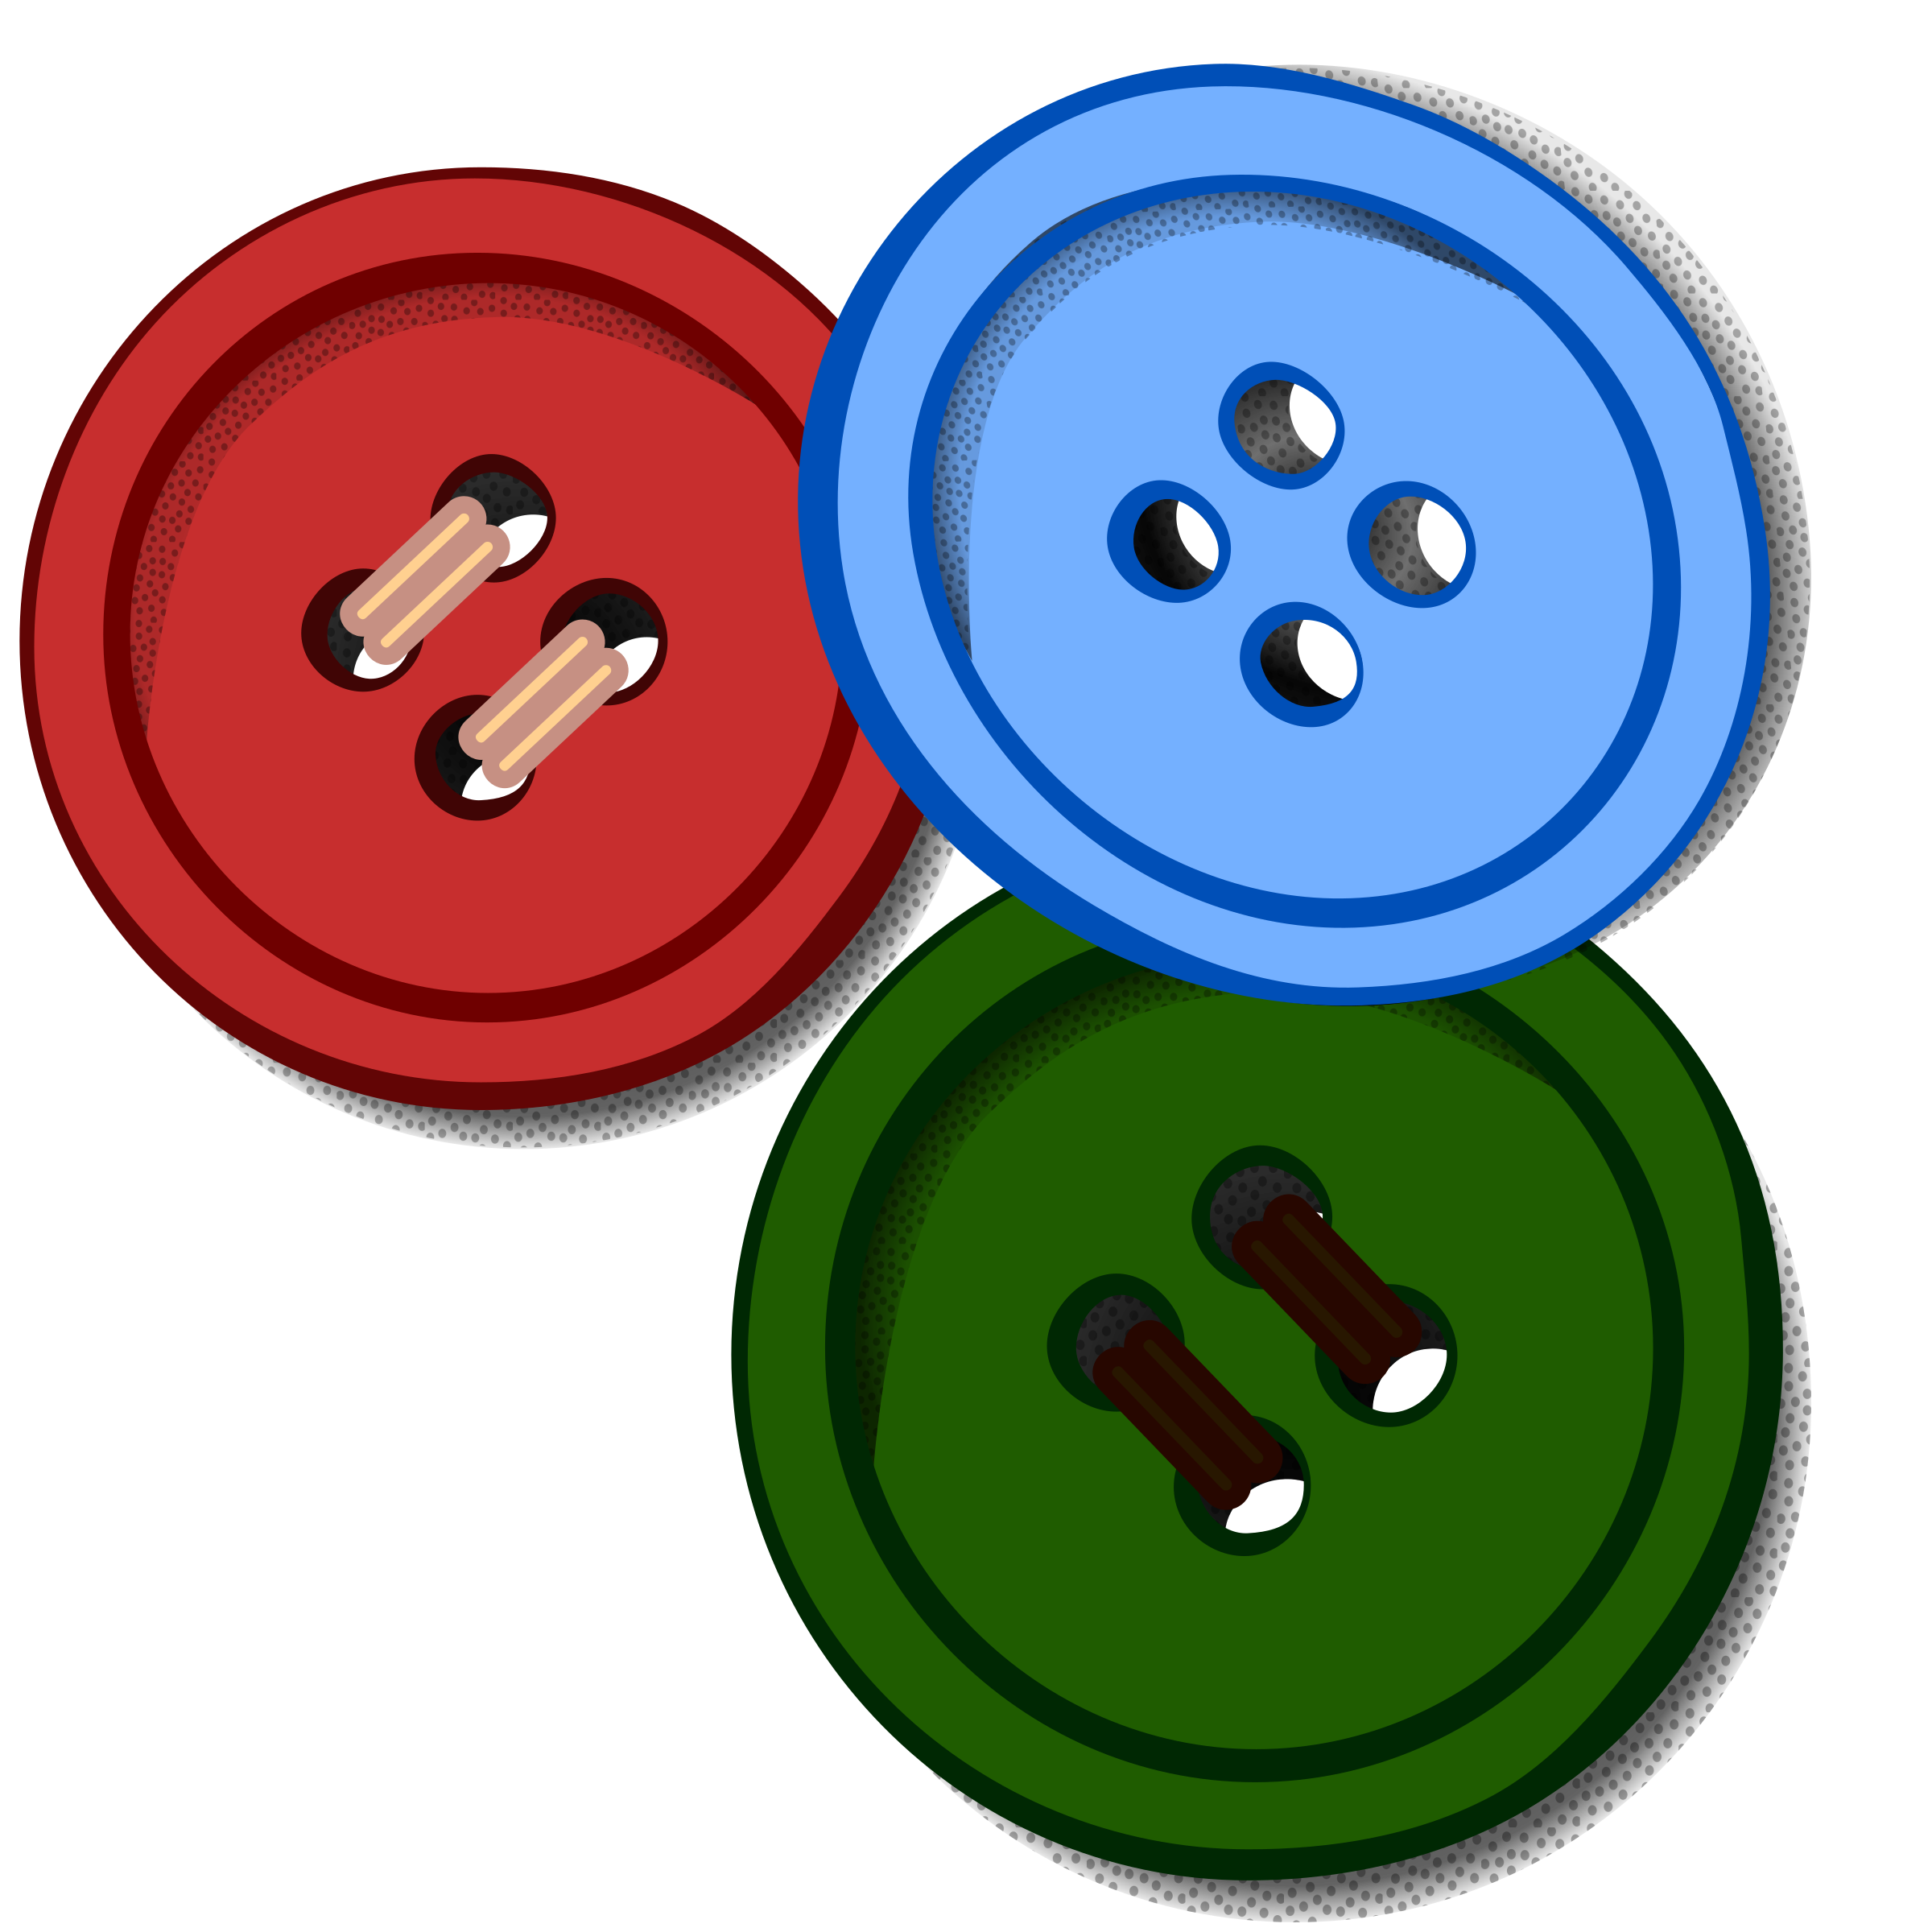 png transparent download Buttons coloured big image. Button clipart.